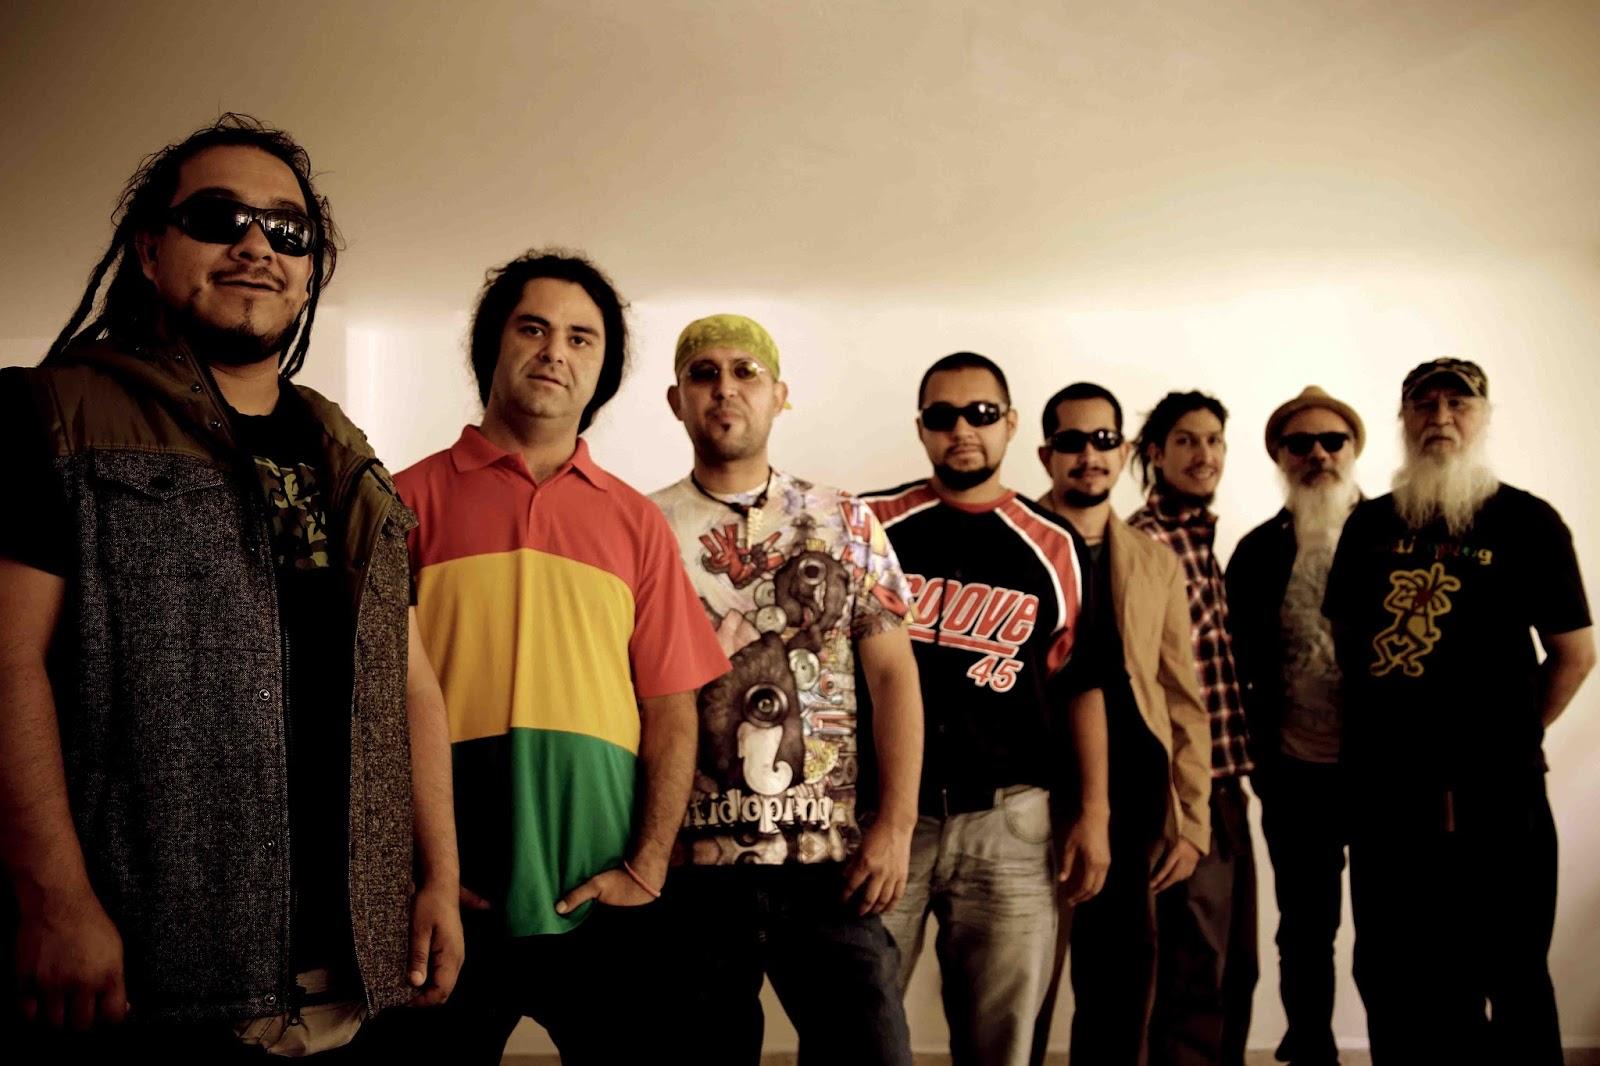 ¿Amante del reggae? Prepárate, Antidoping regresa a Xalapa